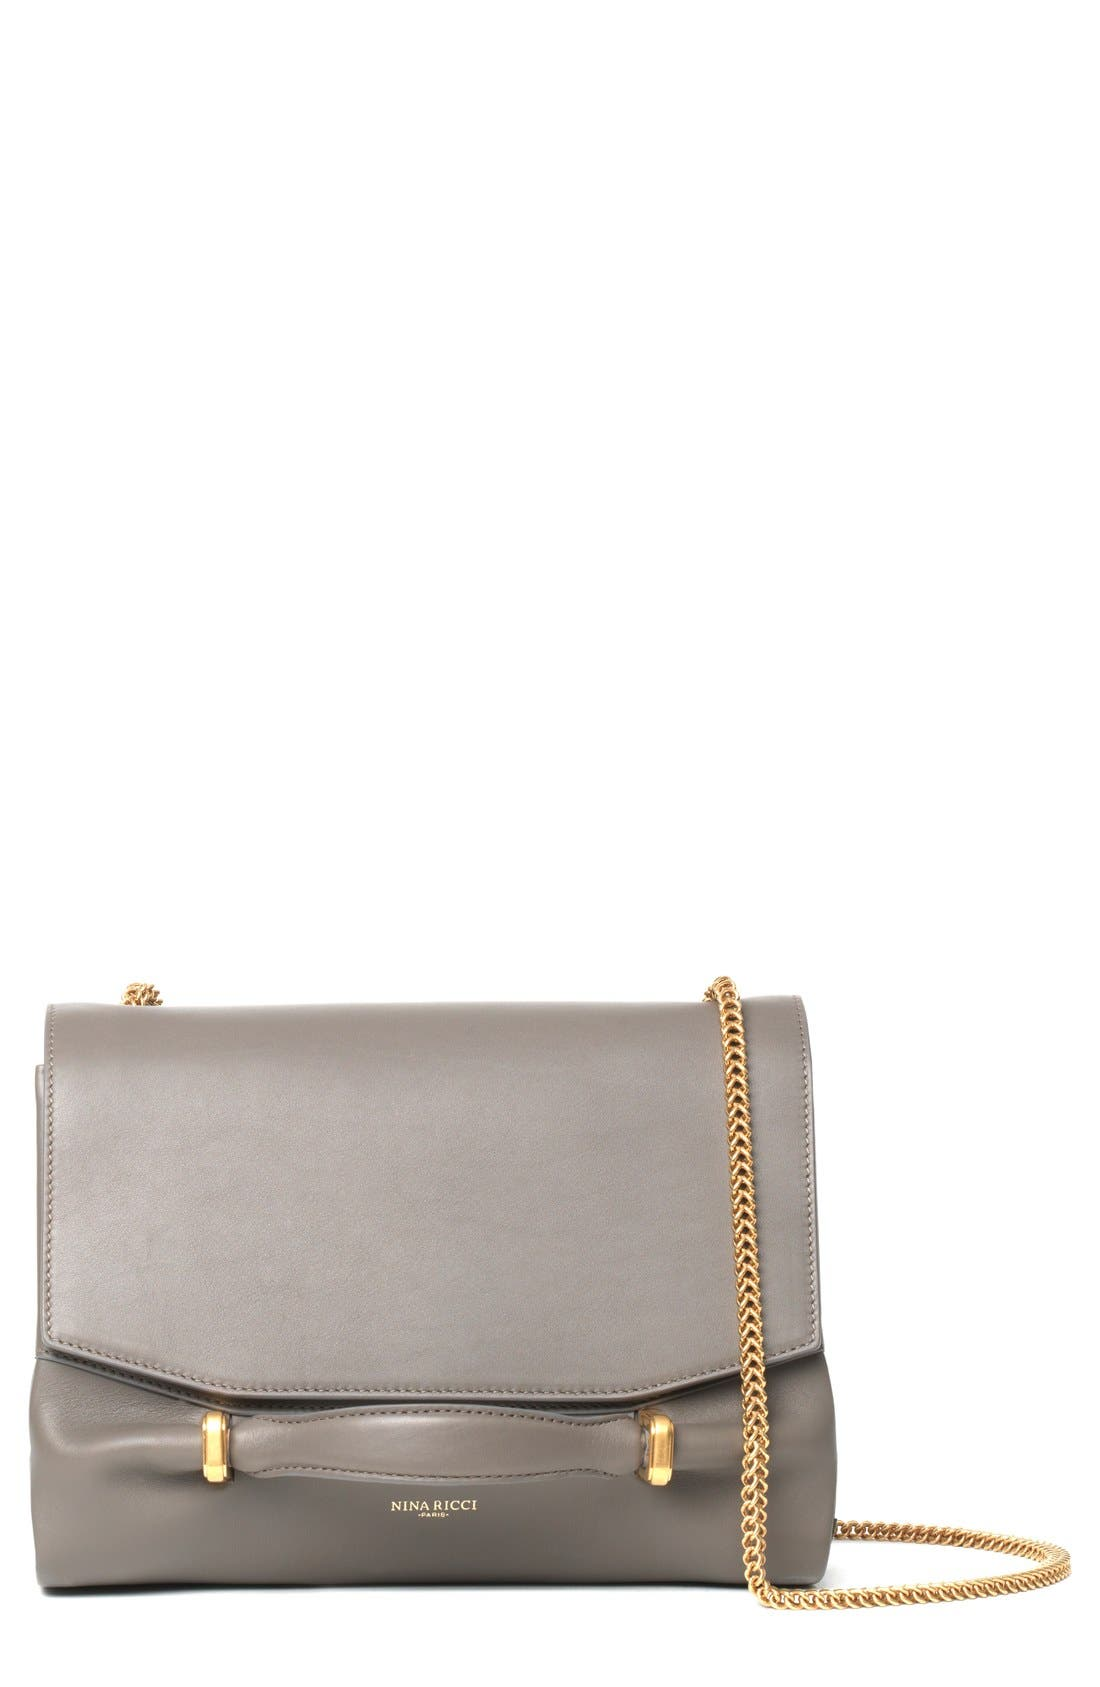 Main Image - Nina Ricci 'Marche' Chain Shoulder Bag